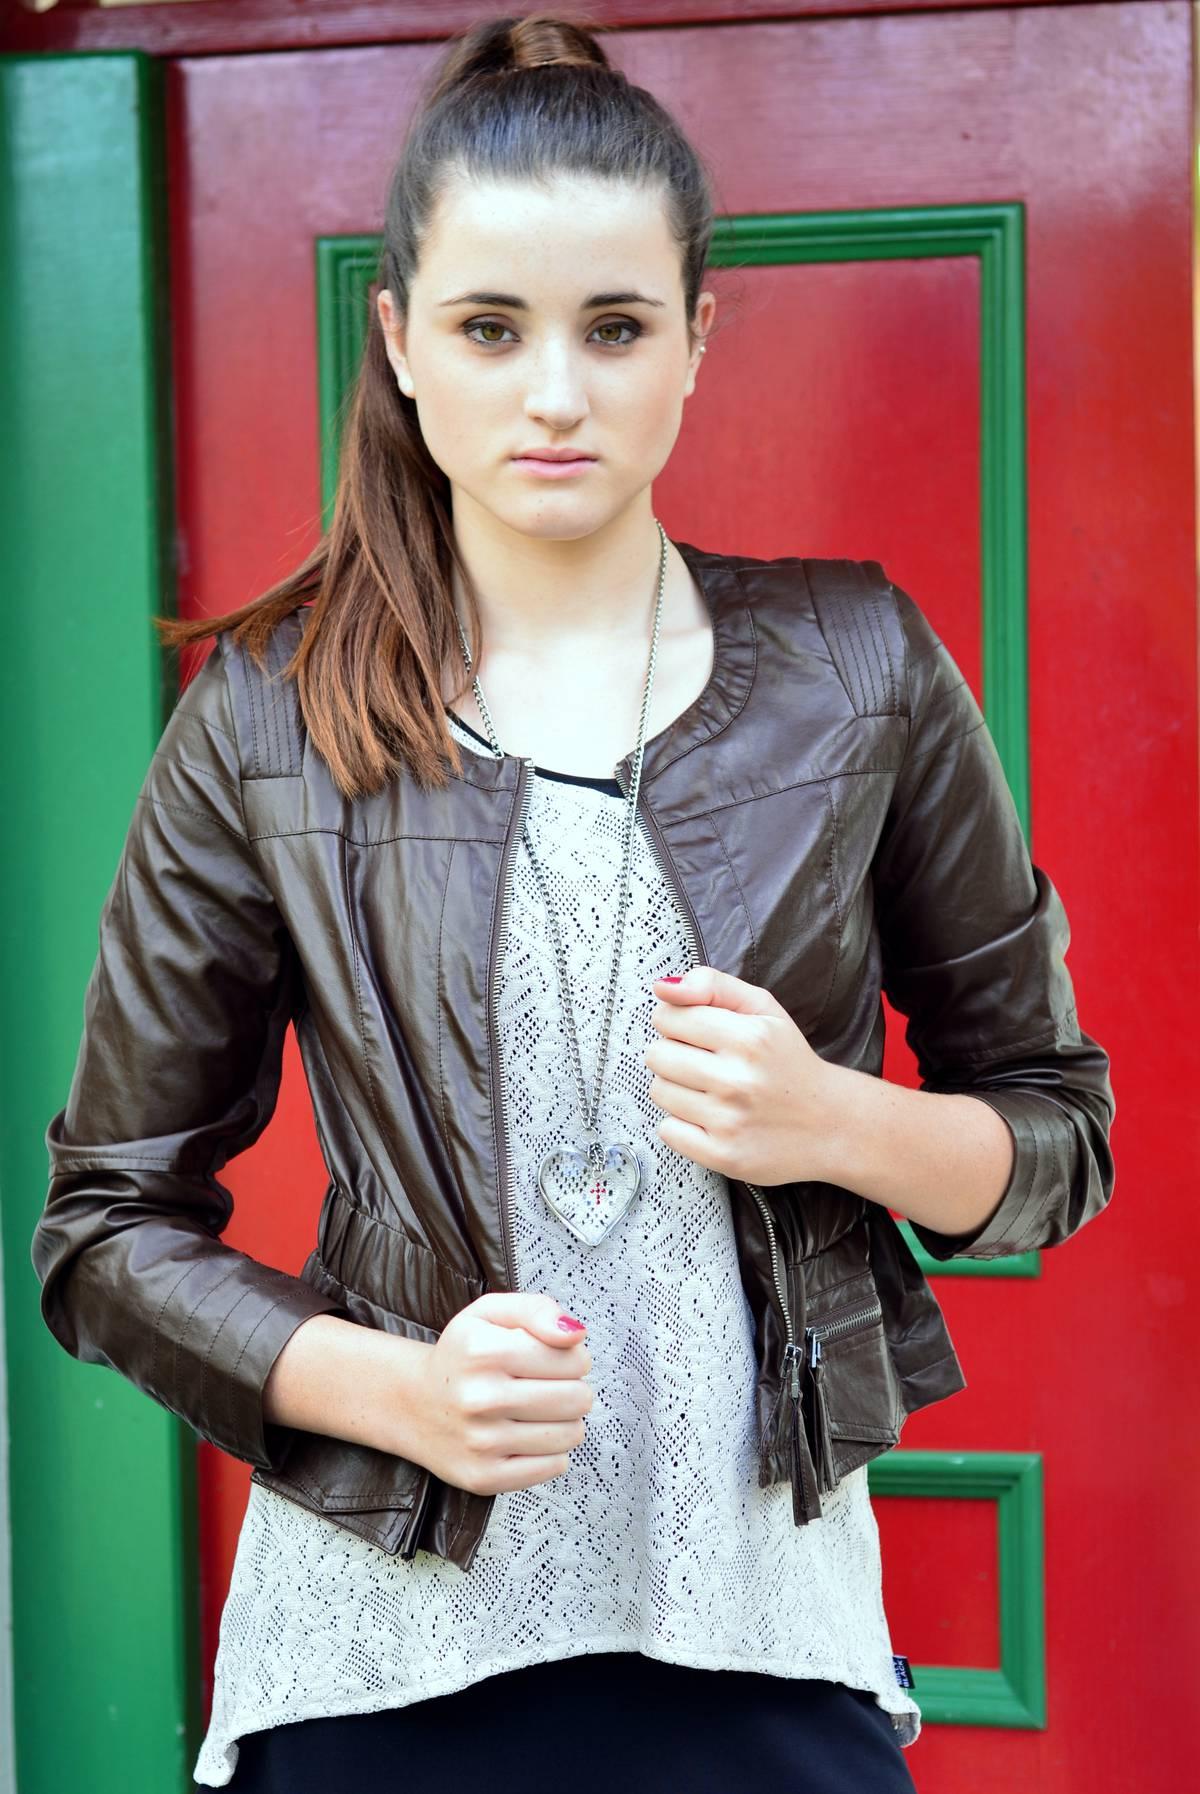 Inkl The New Zealand Herald Tauranga Teen S Designs To Be Showcased Among Top Kiwi Designers